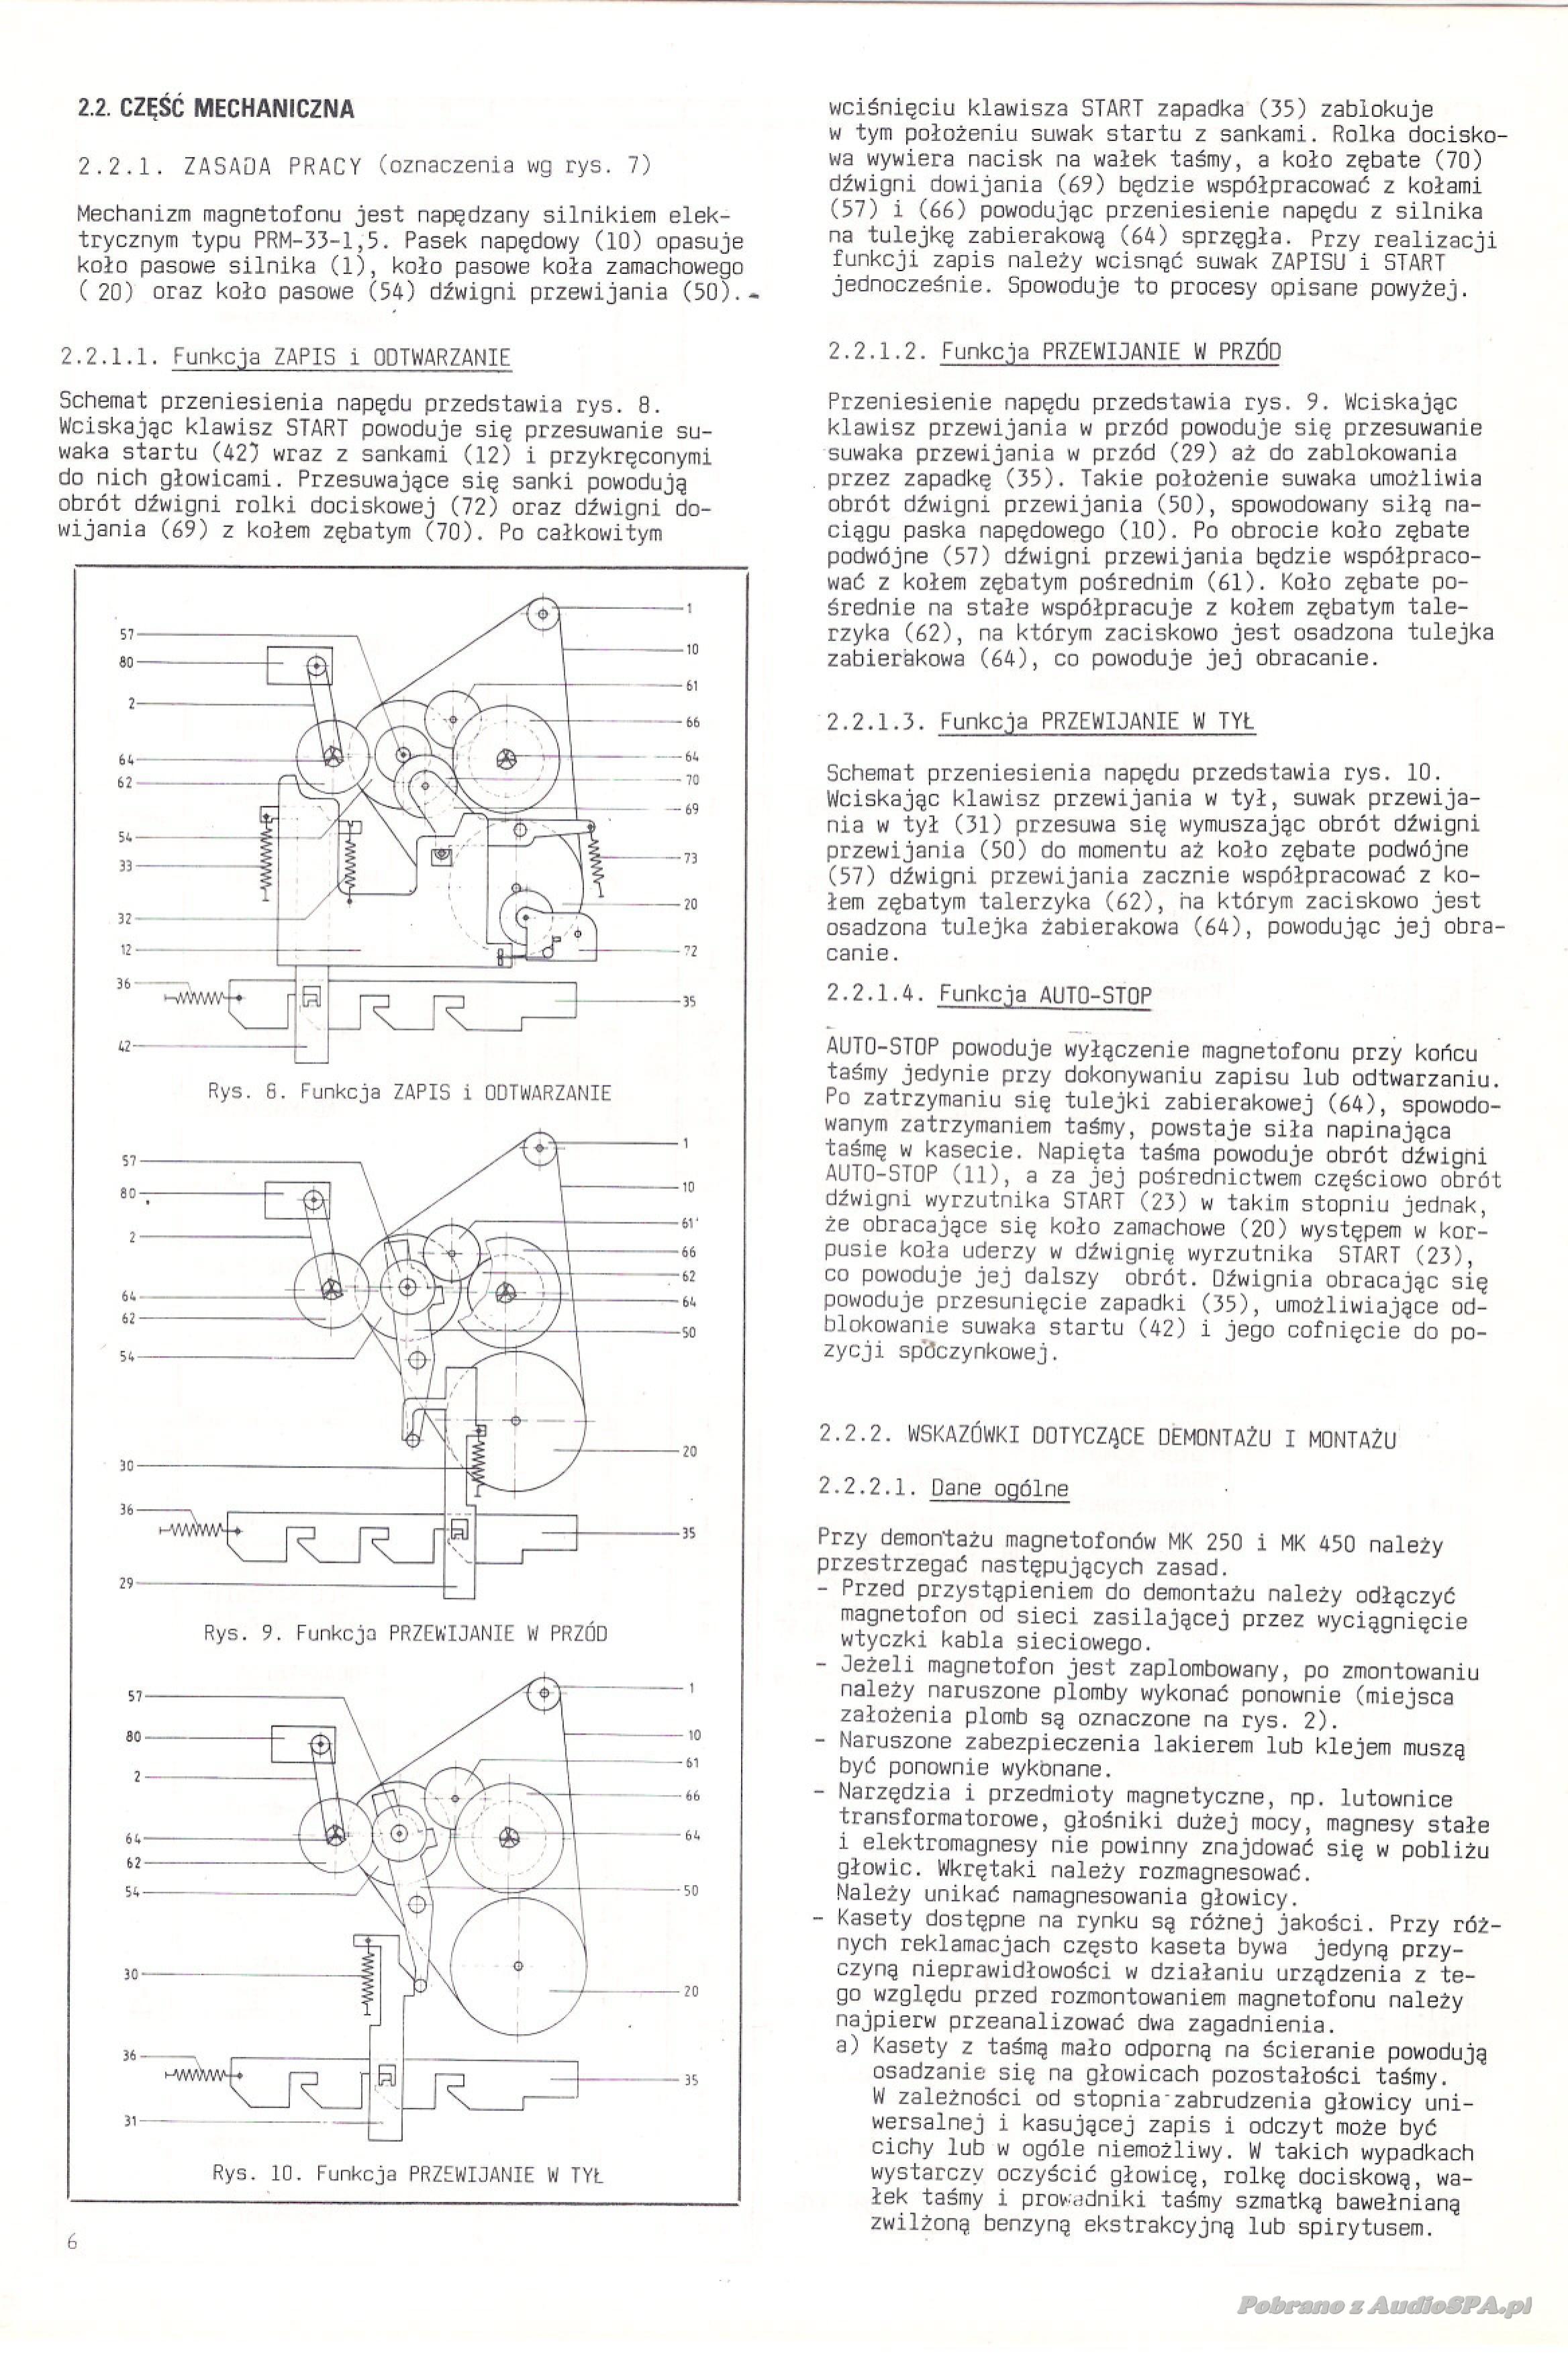 [Kupi�] Ko�o z�bate dowijania Unitra MK-250/MK450